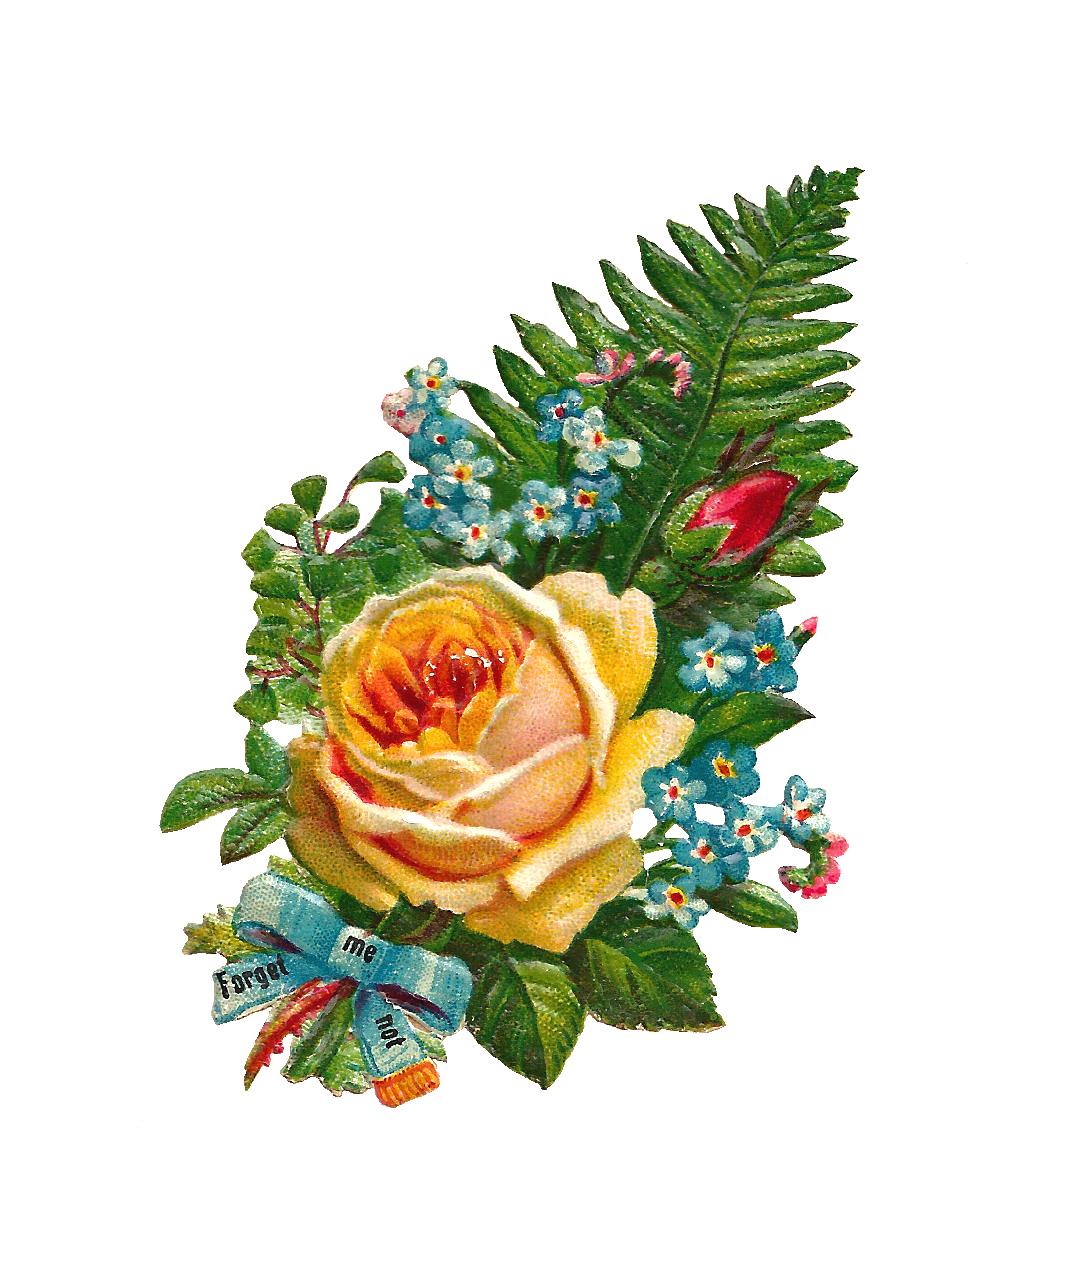 1080x1275 Antique Images Rose Clip Art Obrazki Decoupage